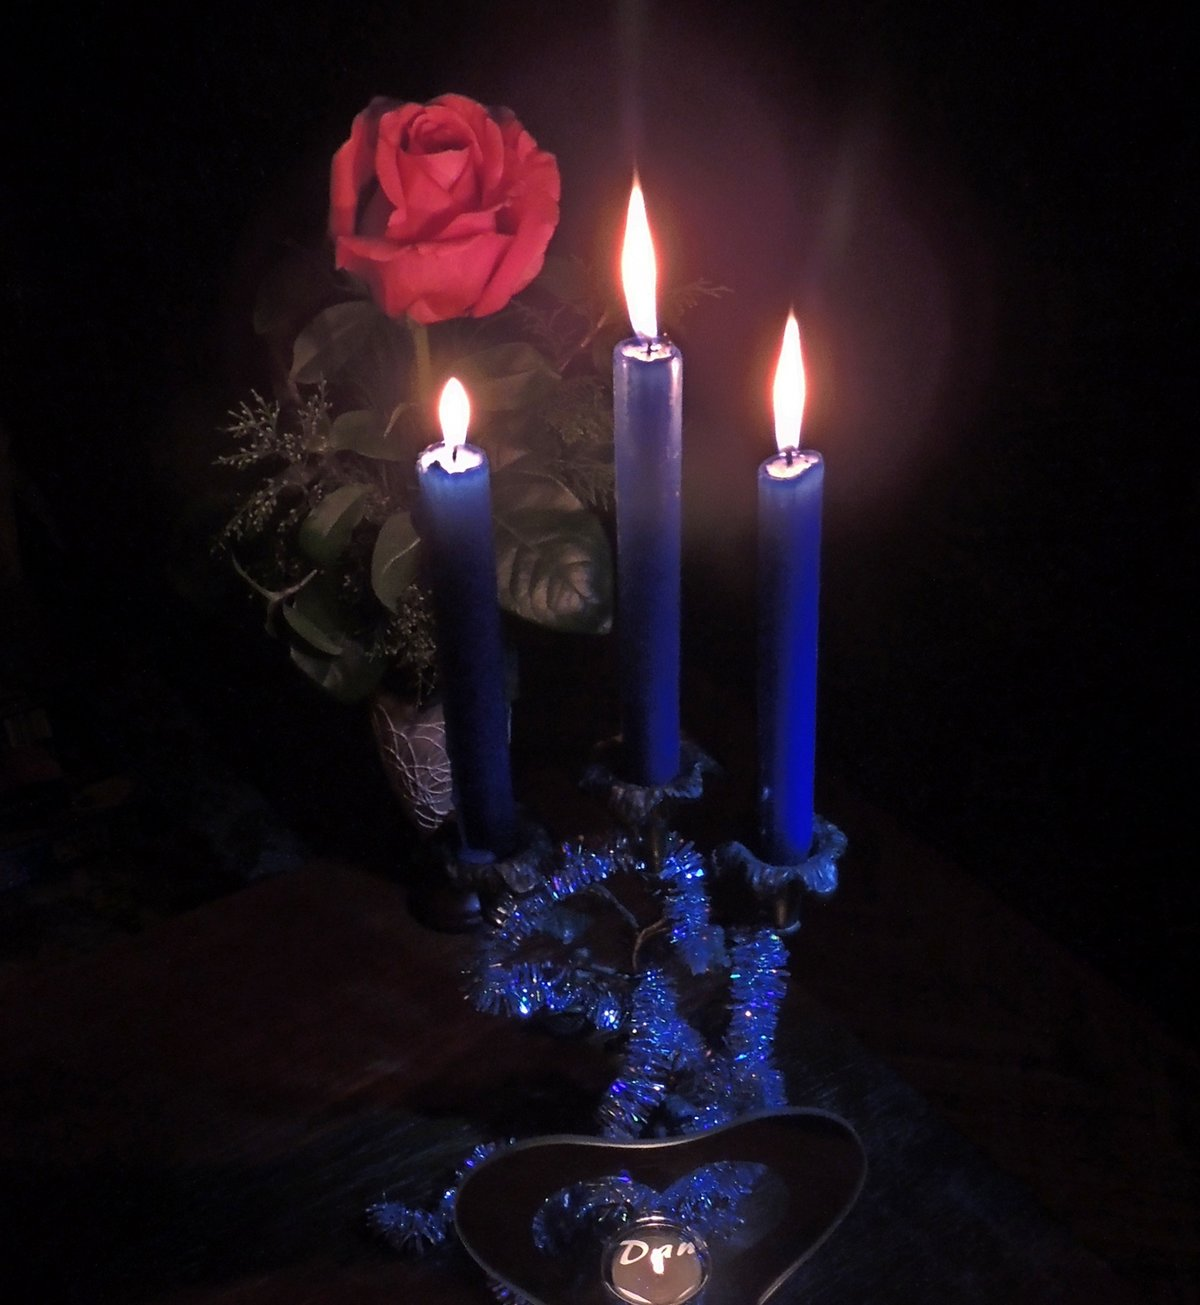 свечи с розами фото уйти